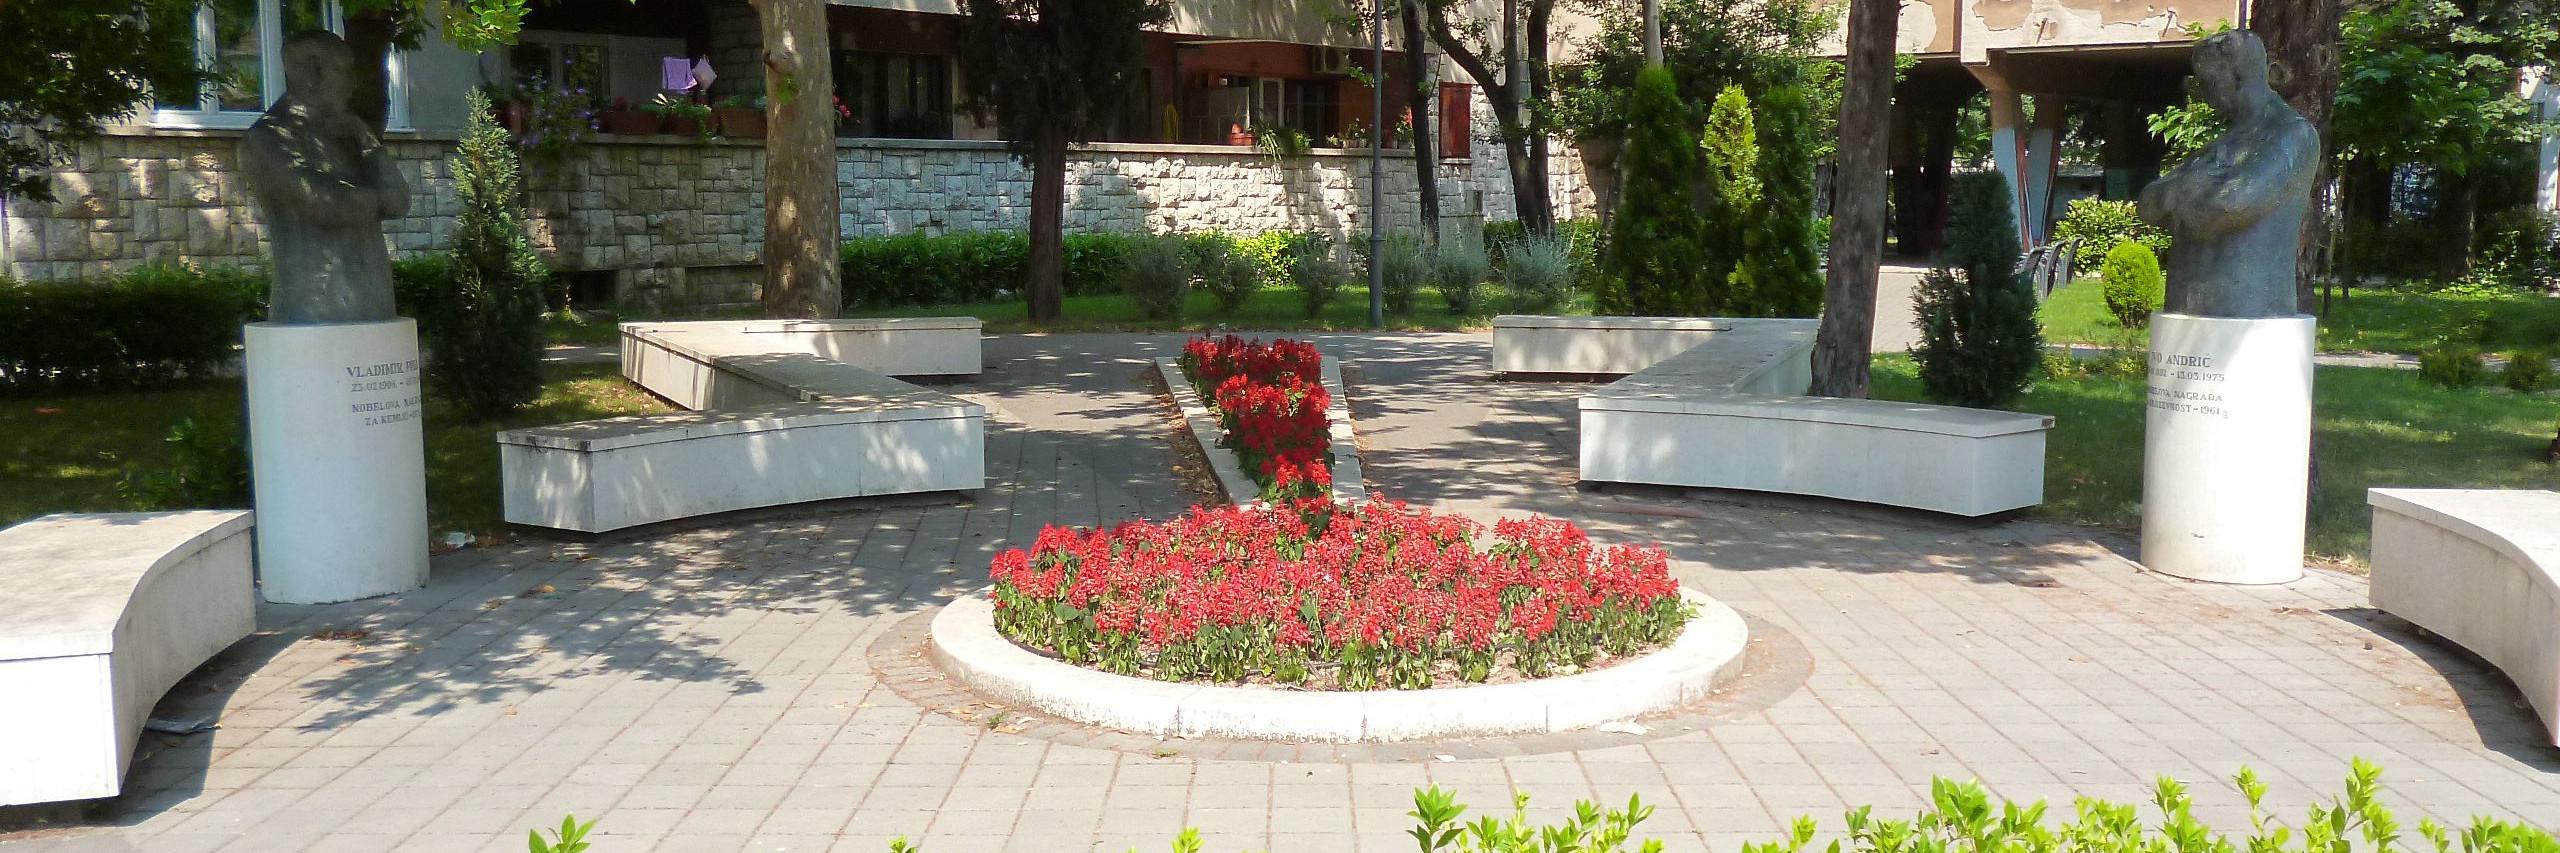 Парк Нобелевских лауреатов. Фото: Елена Арсениевич, CC BY-SA 3.0